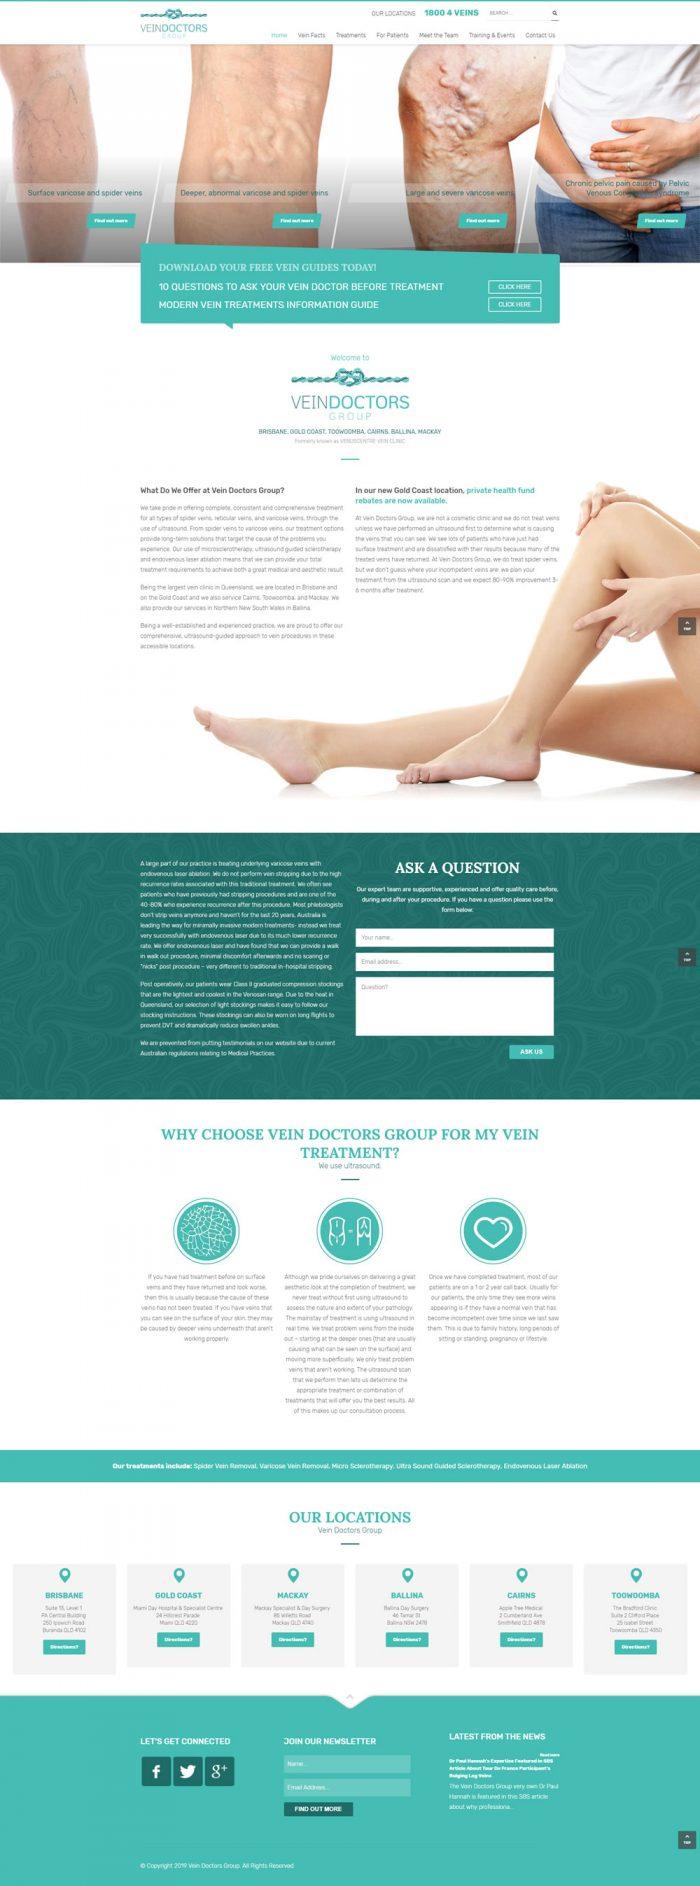 Vein Doctors Group Homepage